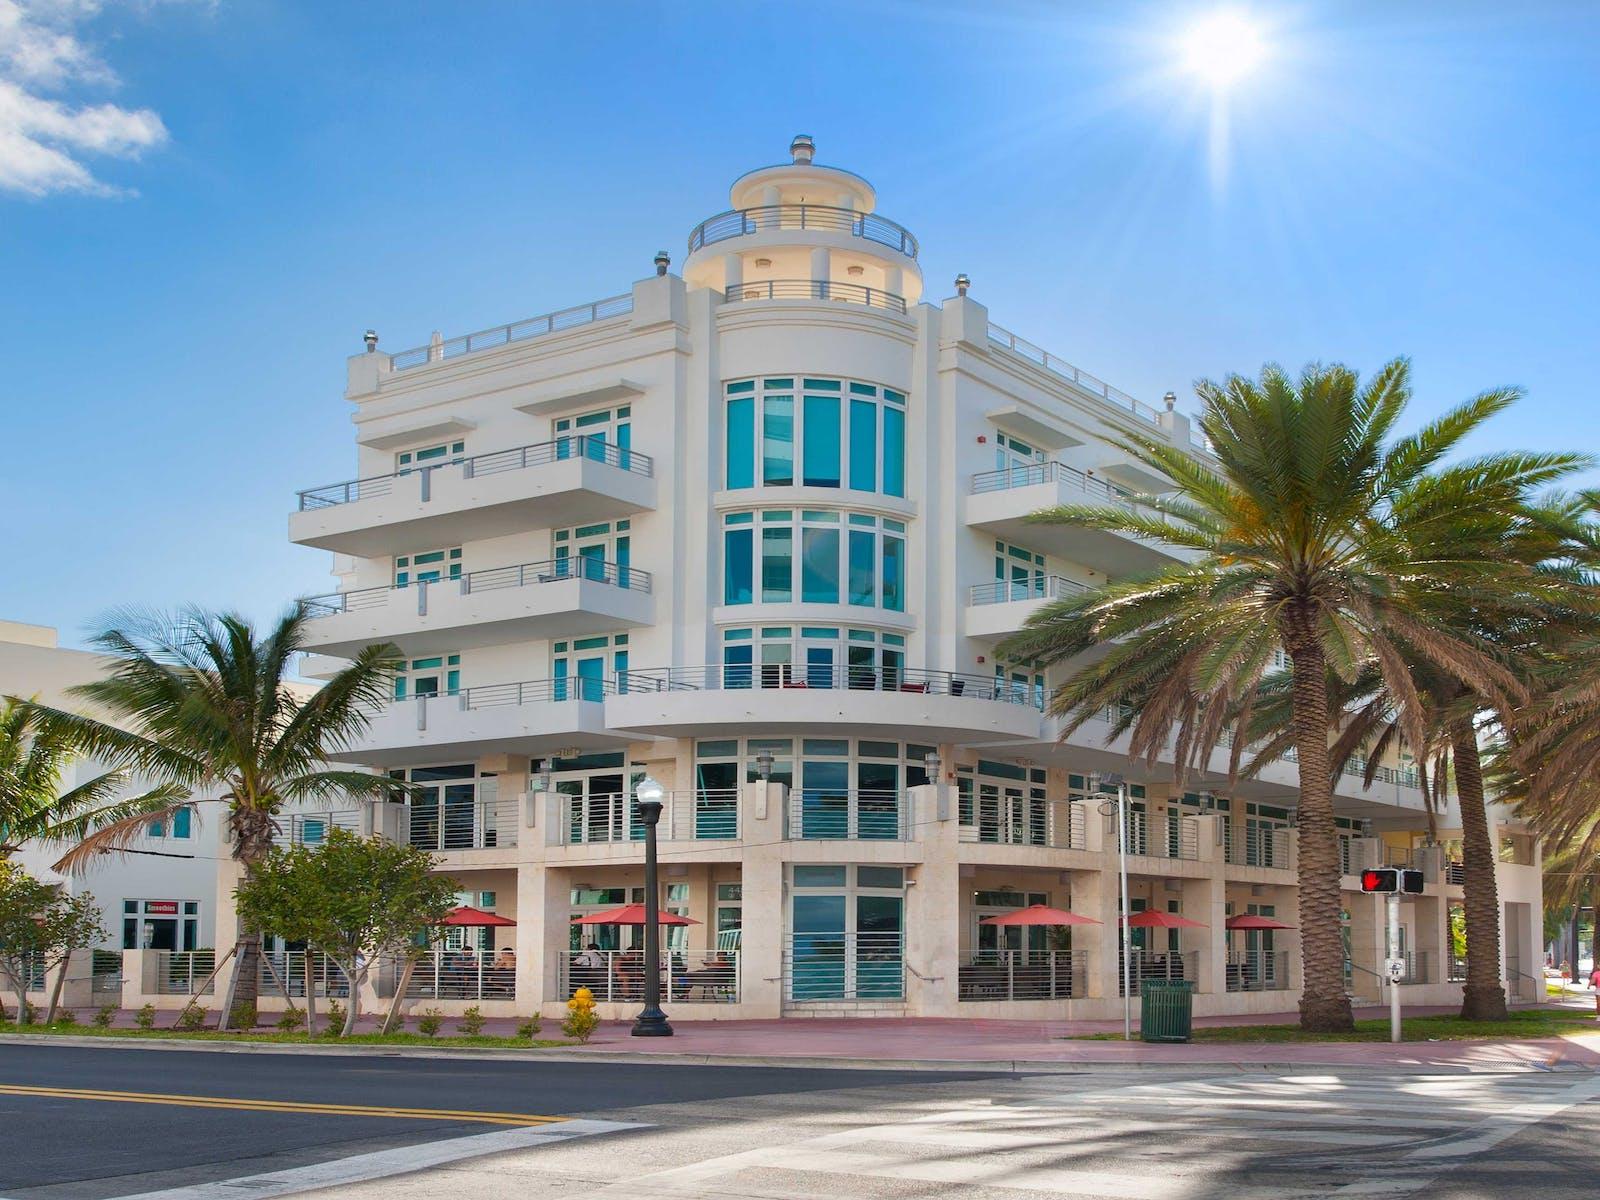 Modern Ocean Drive Condo in Sobe in Miami Beach, Florida